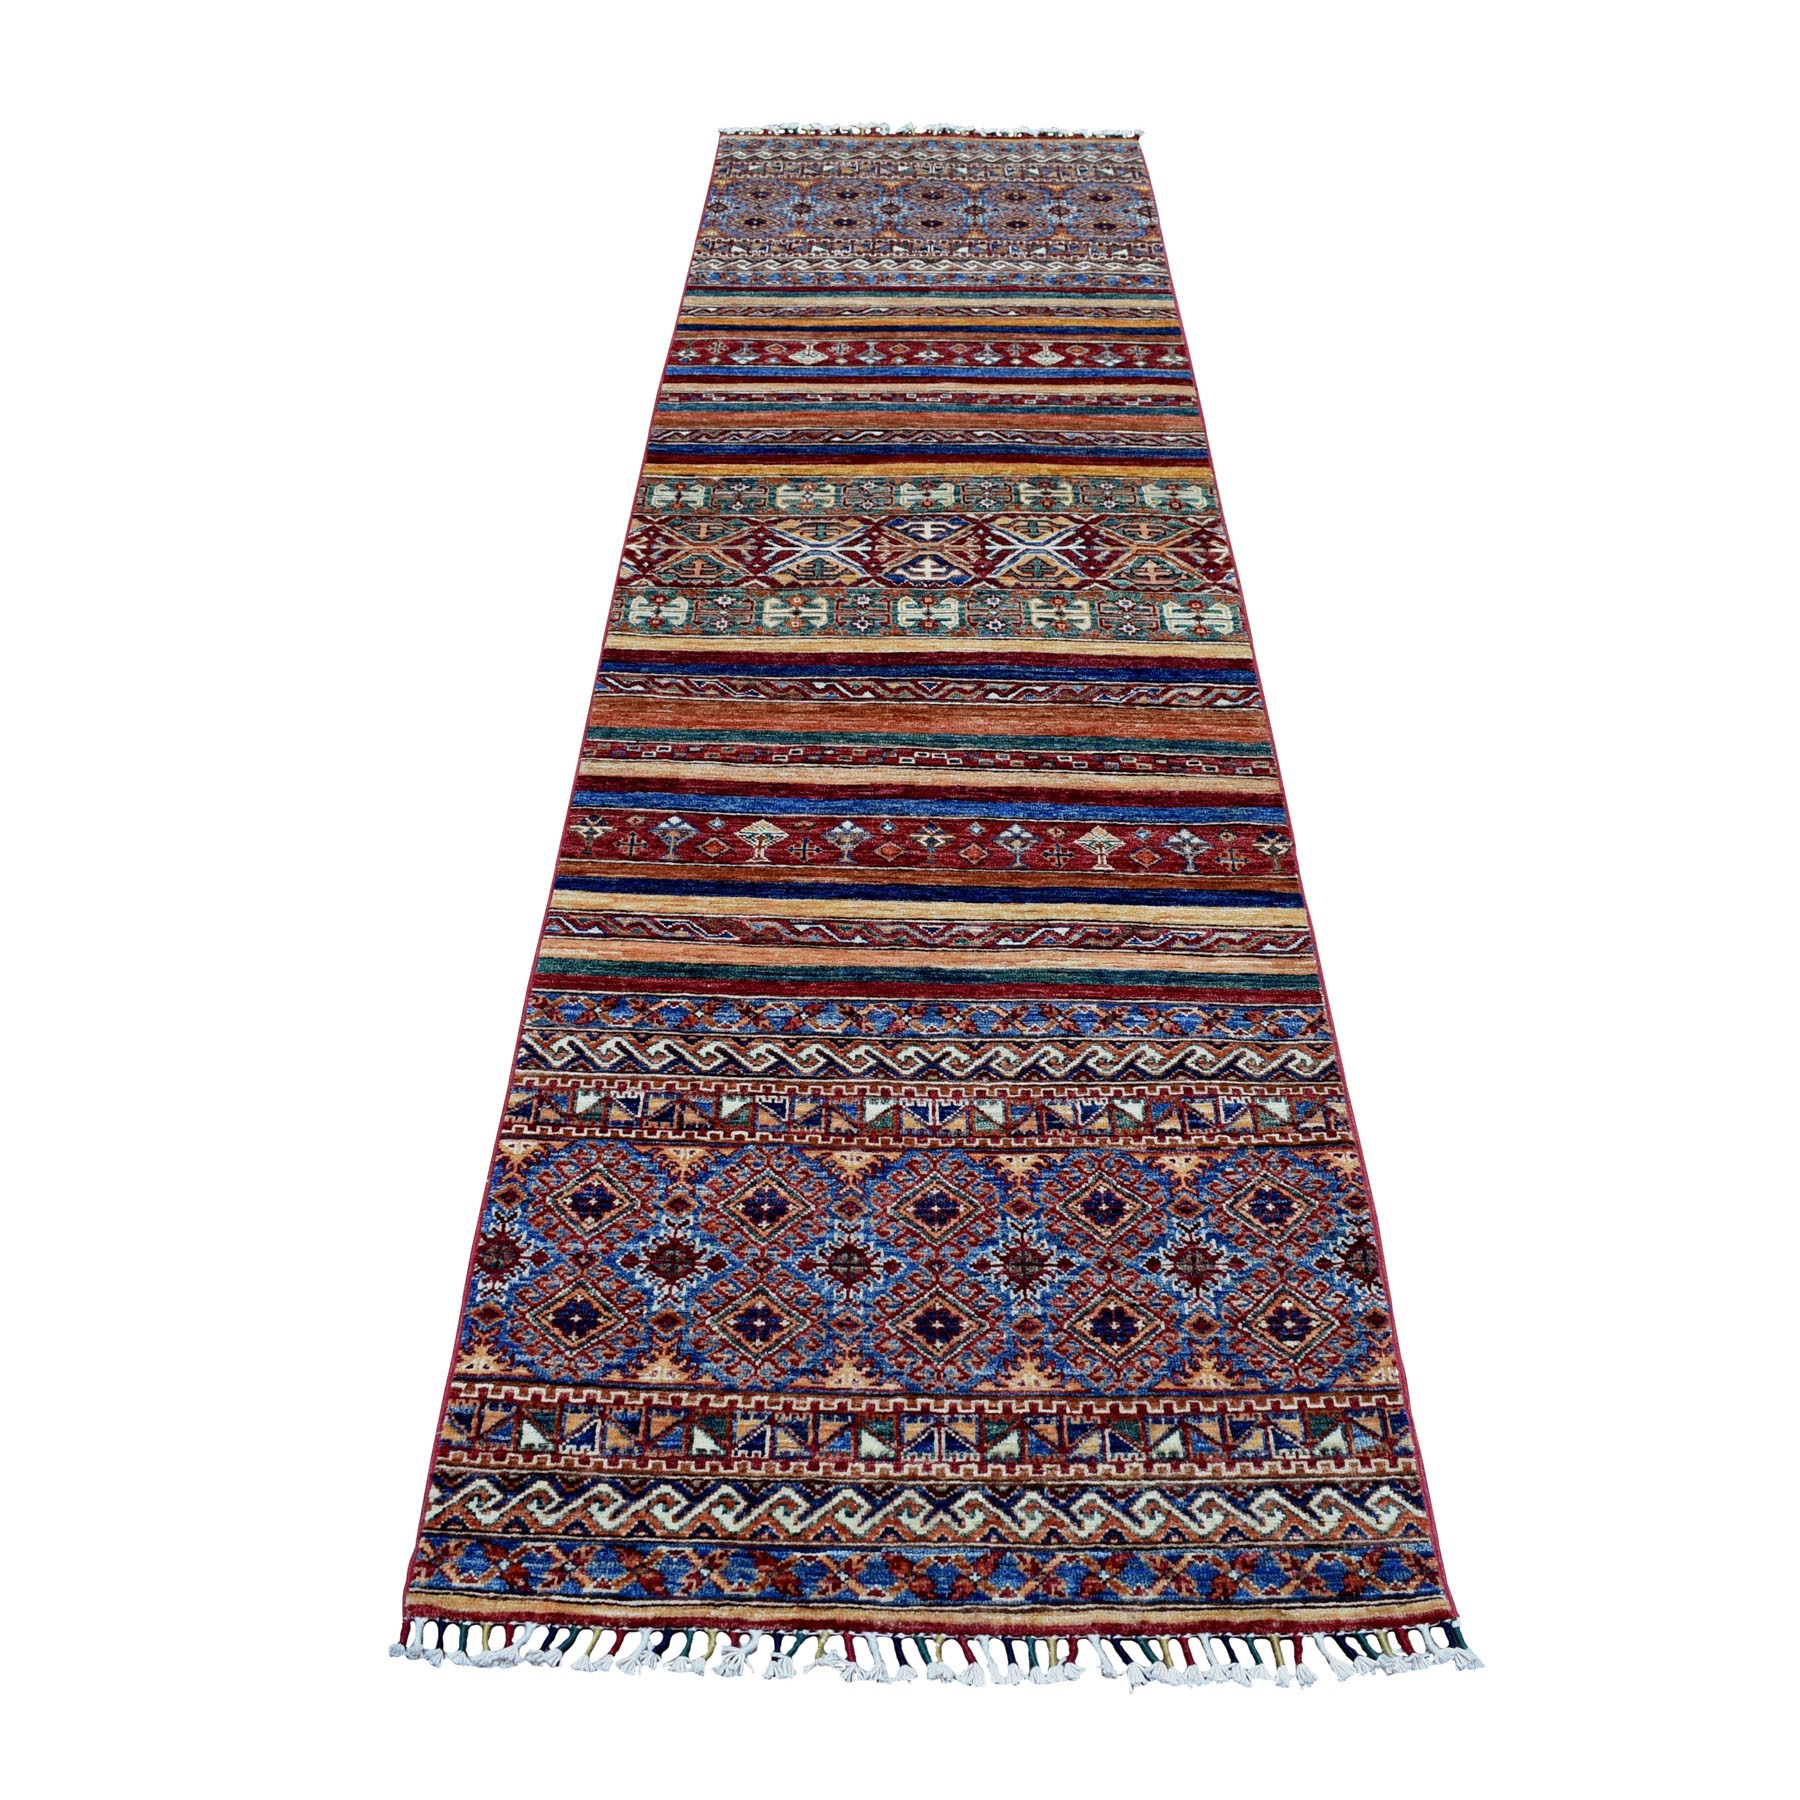 "2'9""x10'1"" Khorjin Design Runner Red Super Kazak Geometric Pure Wool Hand Knotted Oriental Rug 52754"